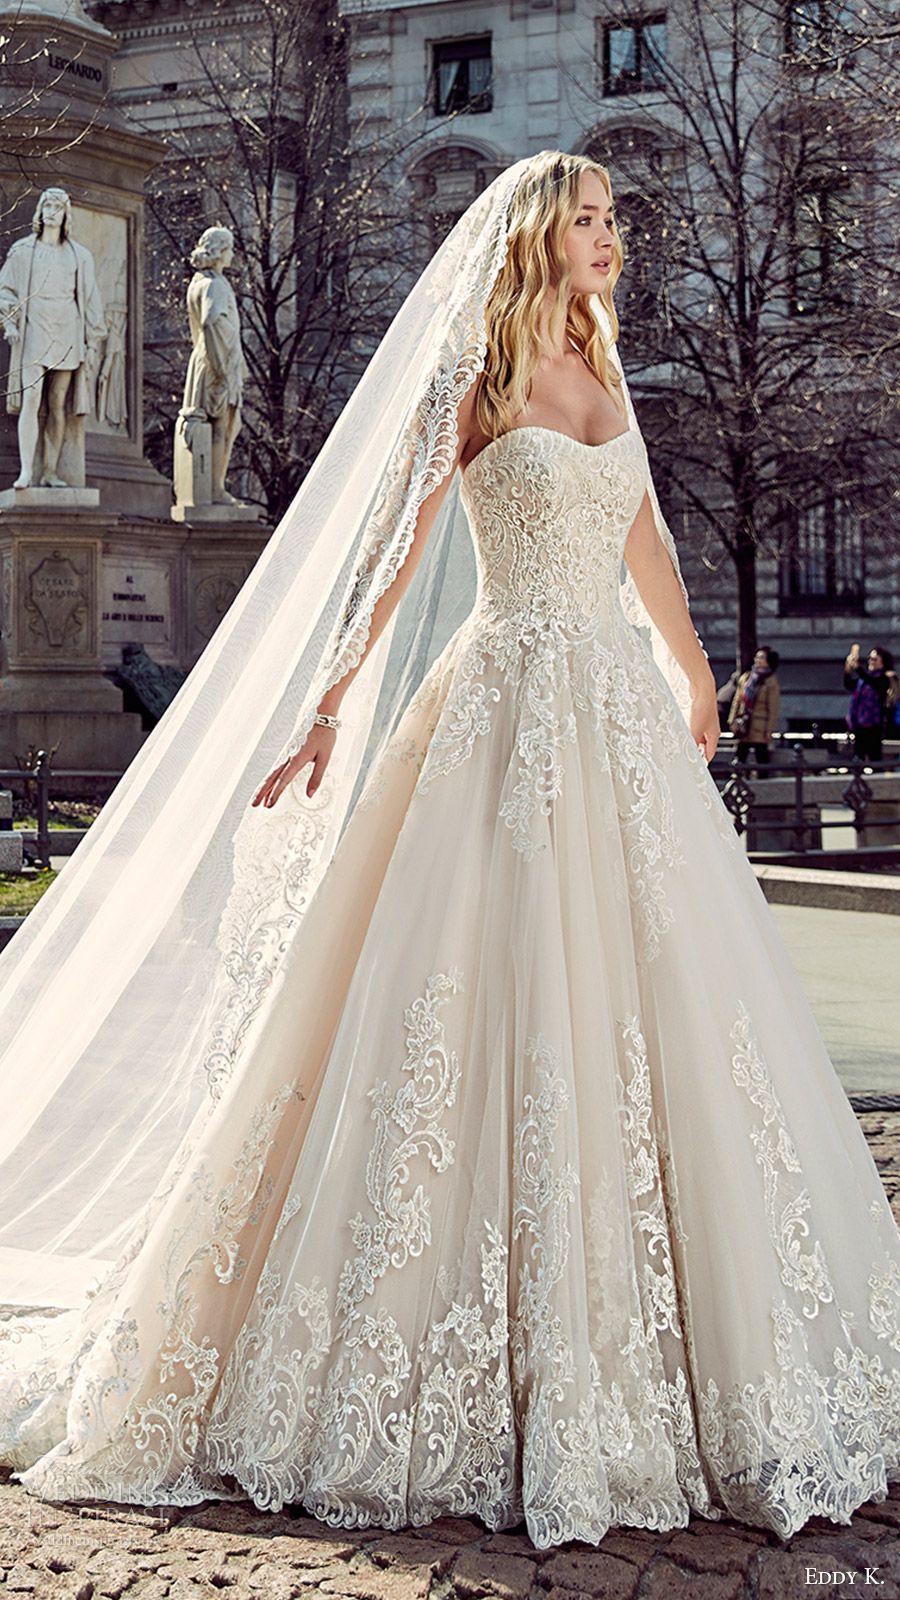 Pin by anna nikkanen on pretty things pinterest wedding dresses